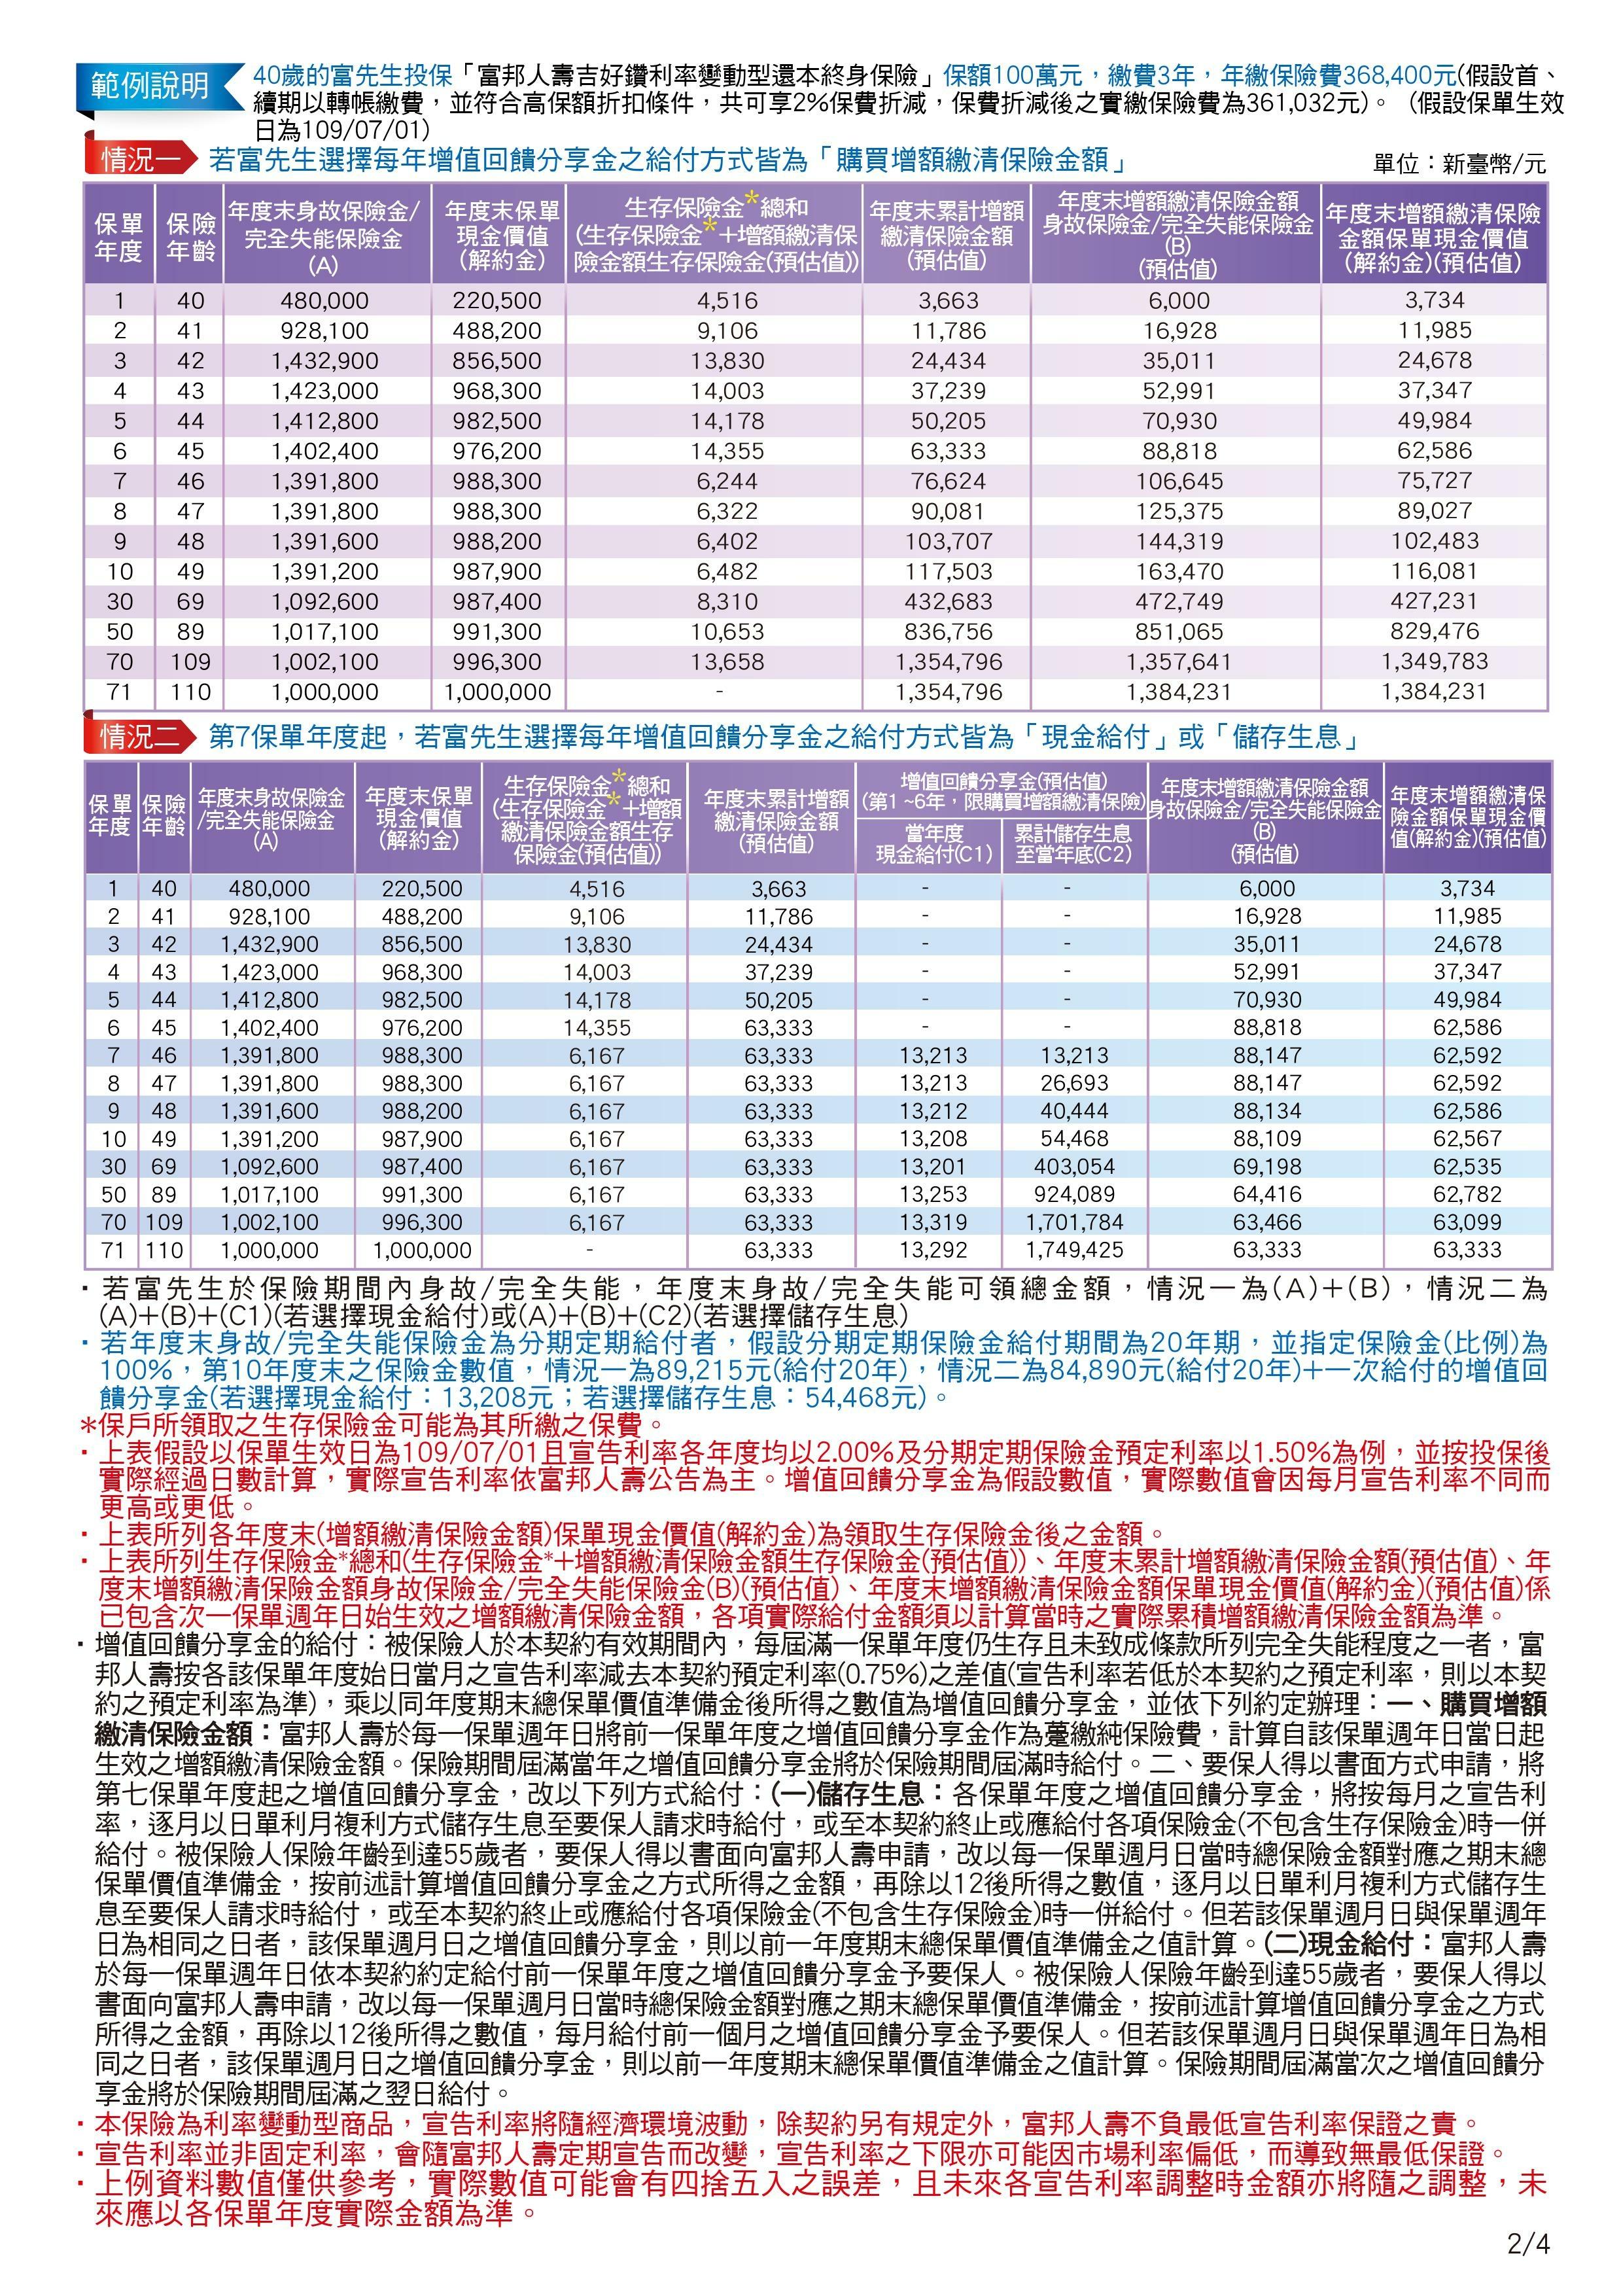 0002 - 2021-01-28T215210.576.jpg